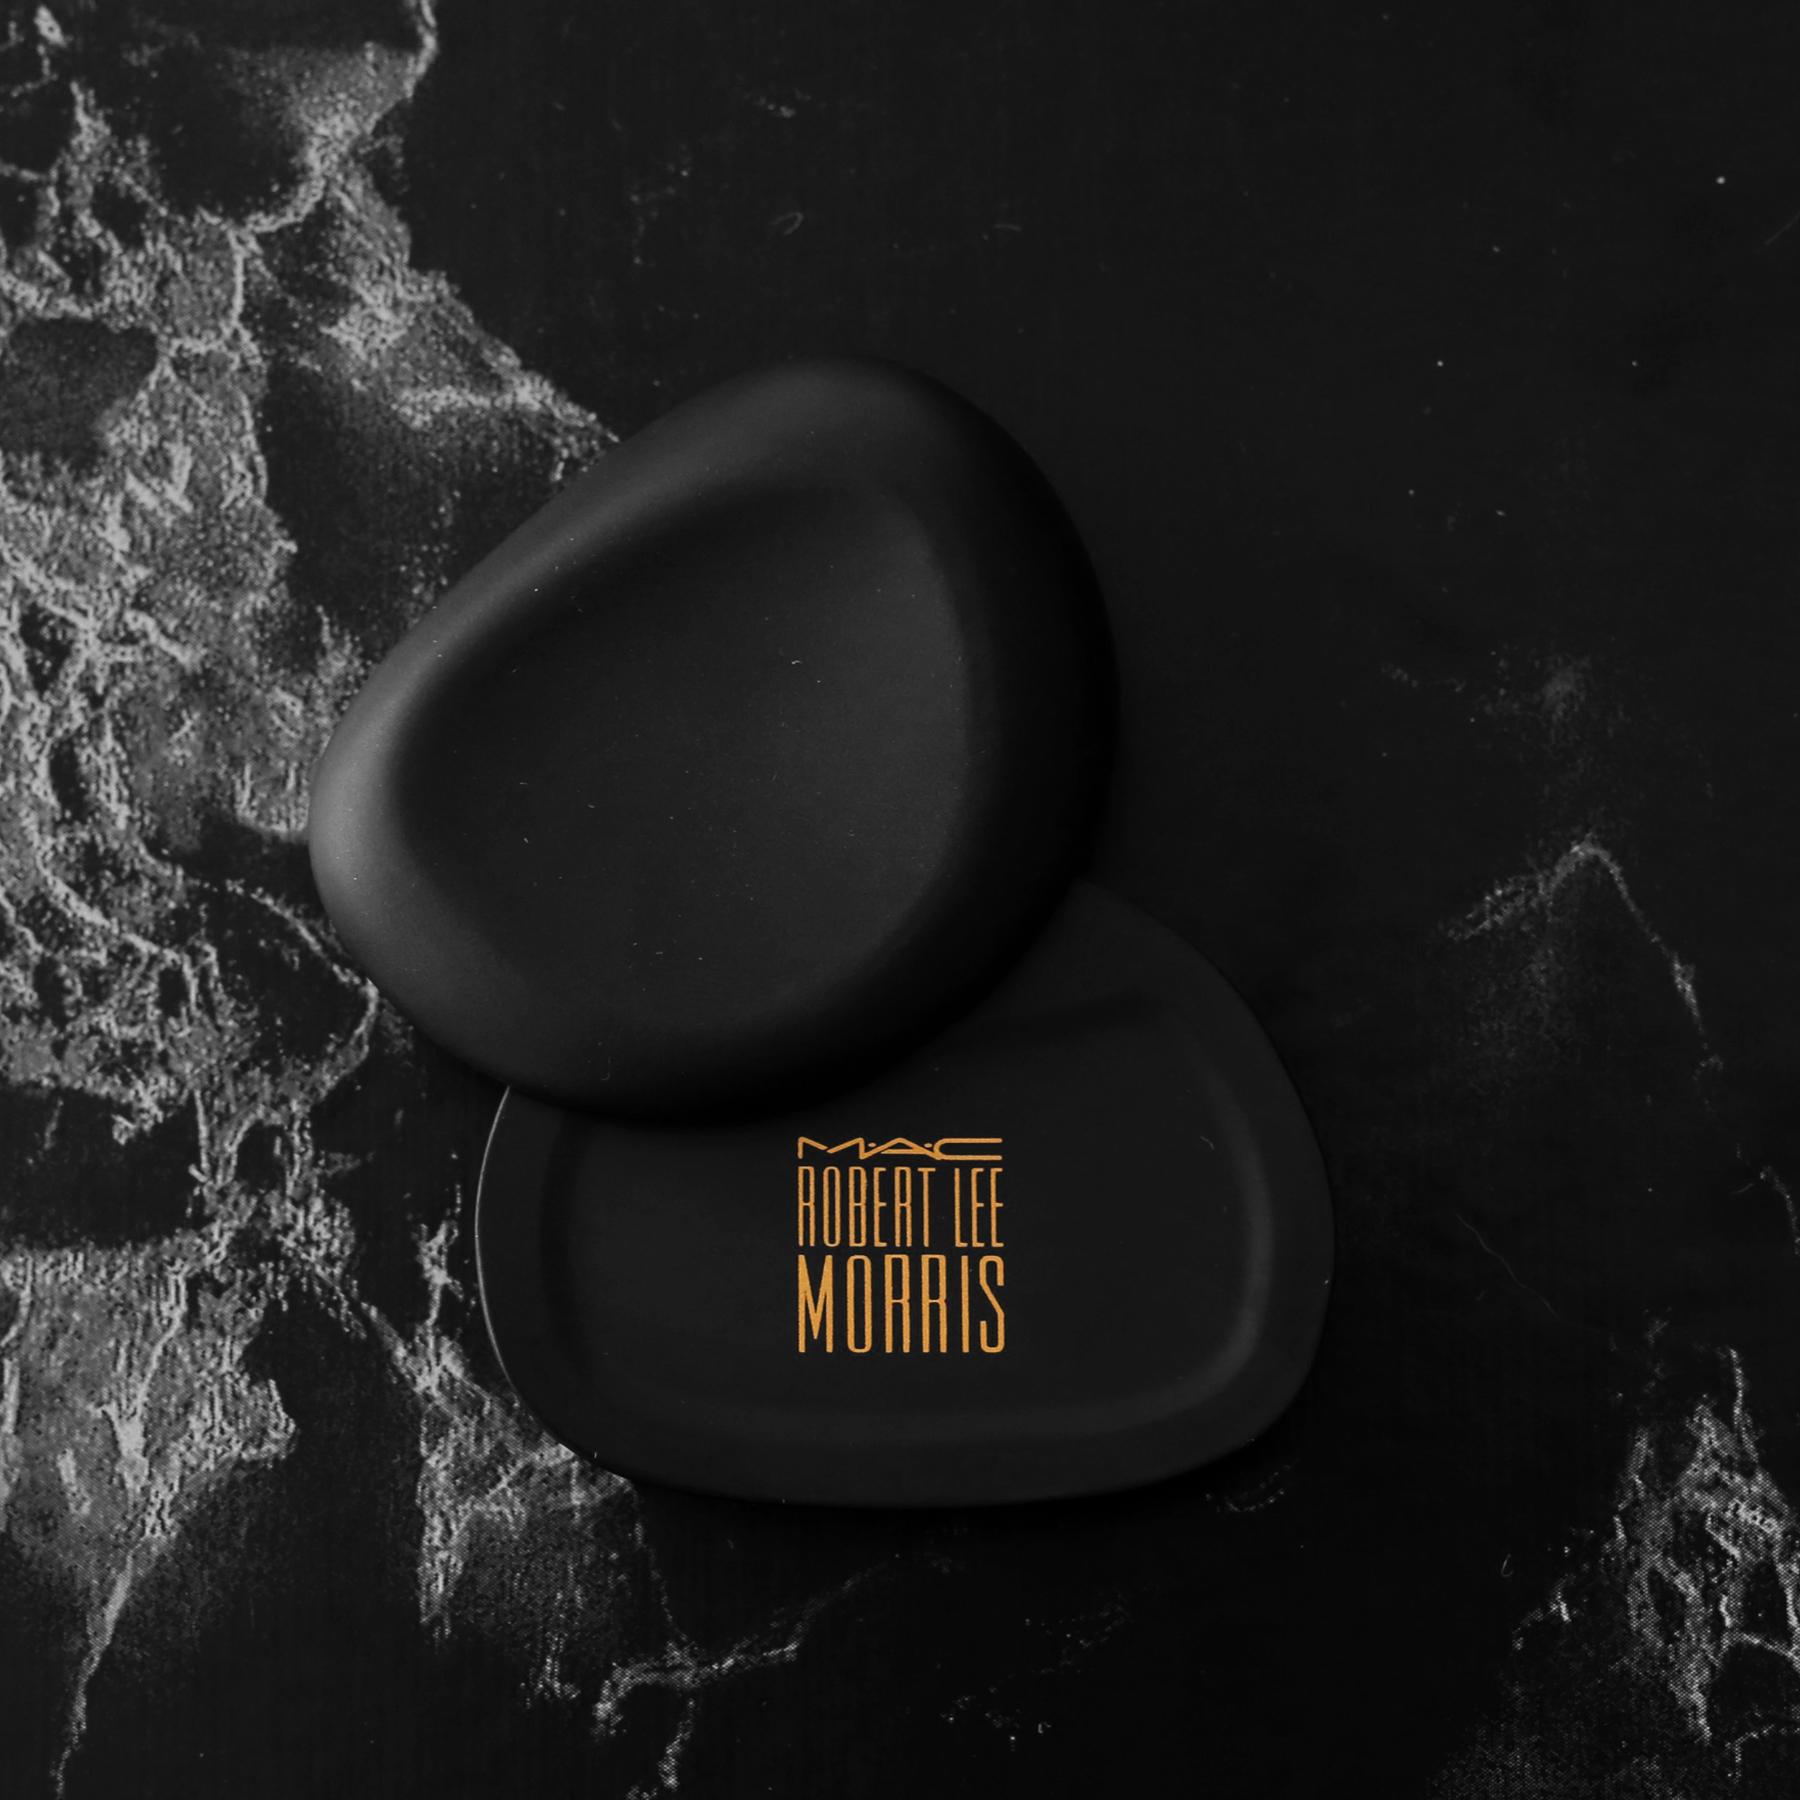 MAC x Robert Lee Morris makeup collection 2017 - limited edition pebble compact - beauty_5530.jpg